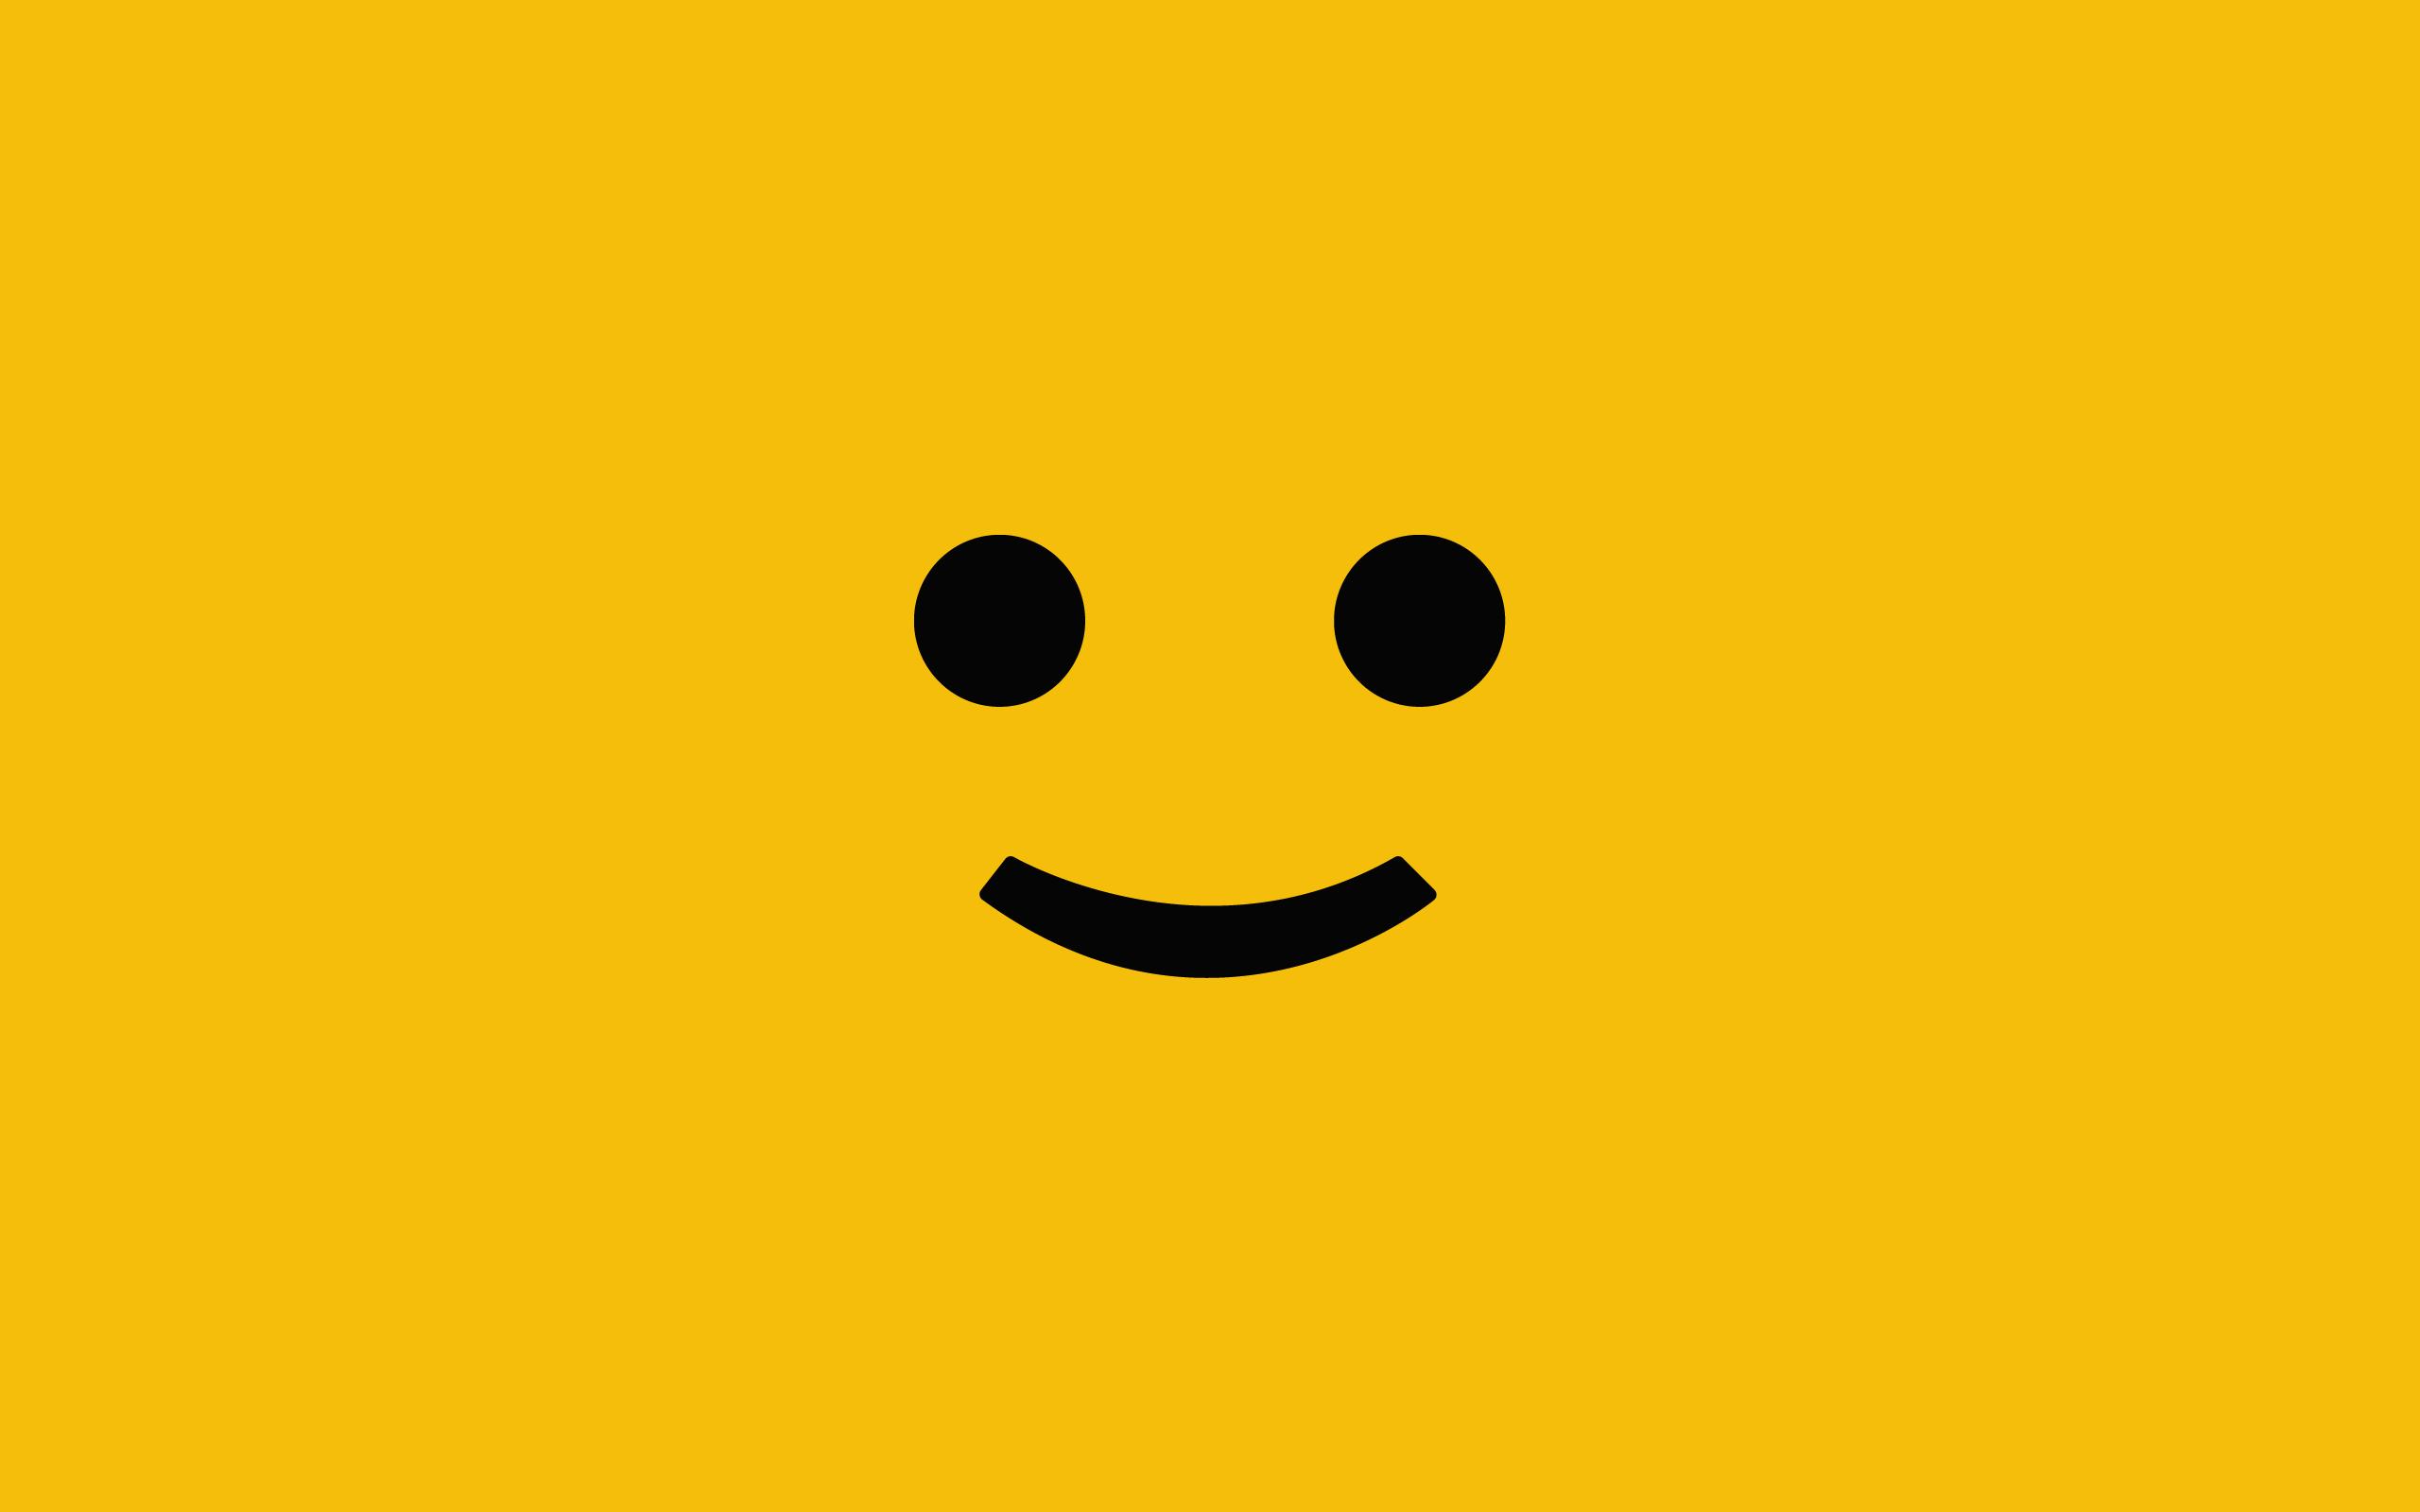 Minimalist Wallpapers Imgur Lego Wallpaper Minimalist Desktop Wallpaper Yellow Wallpaper